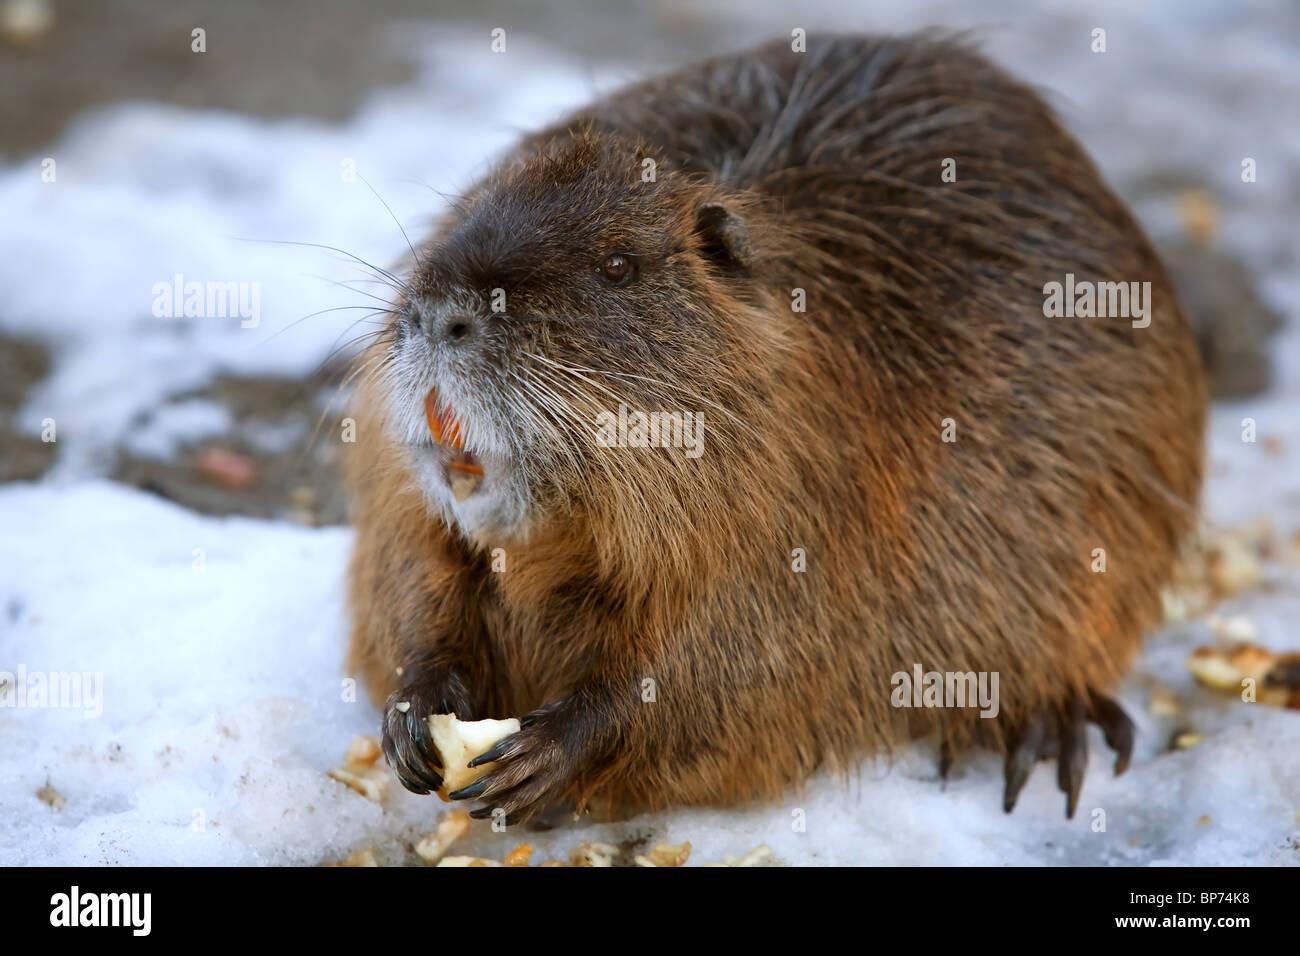 Beaver gallery mature